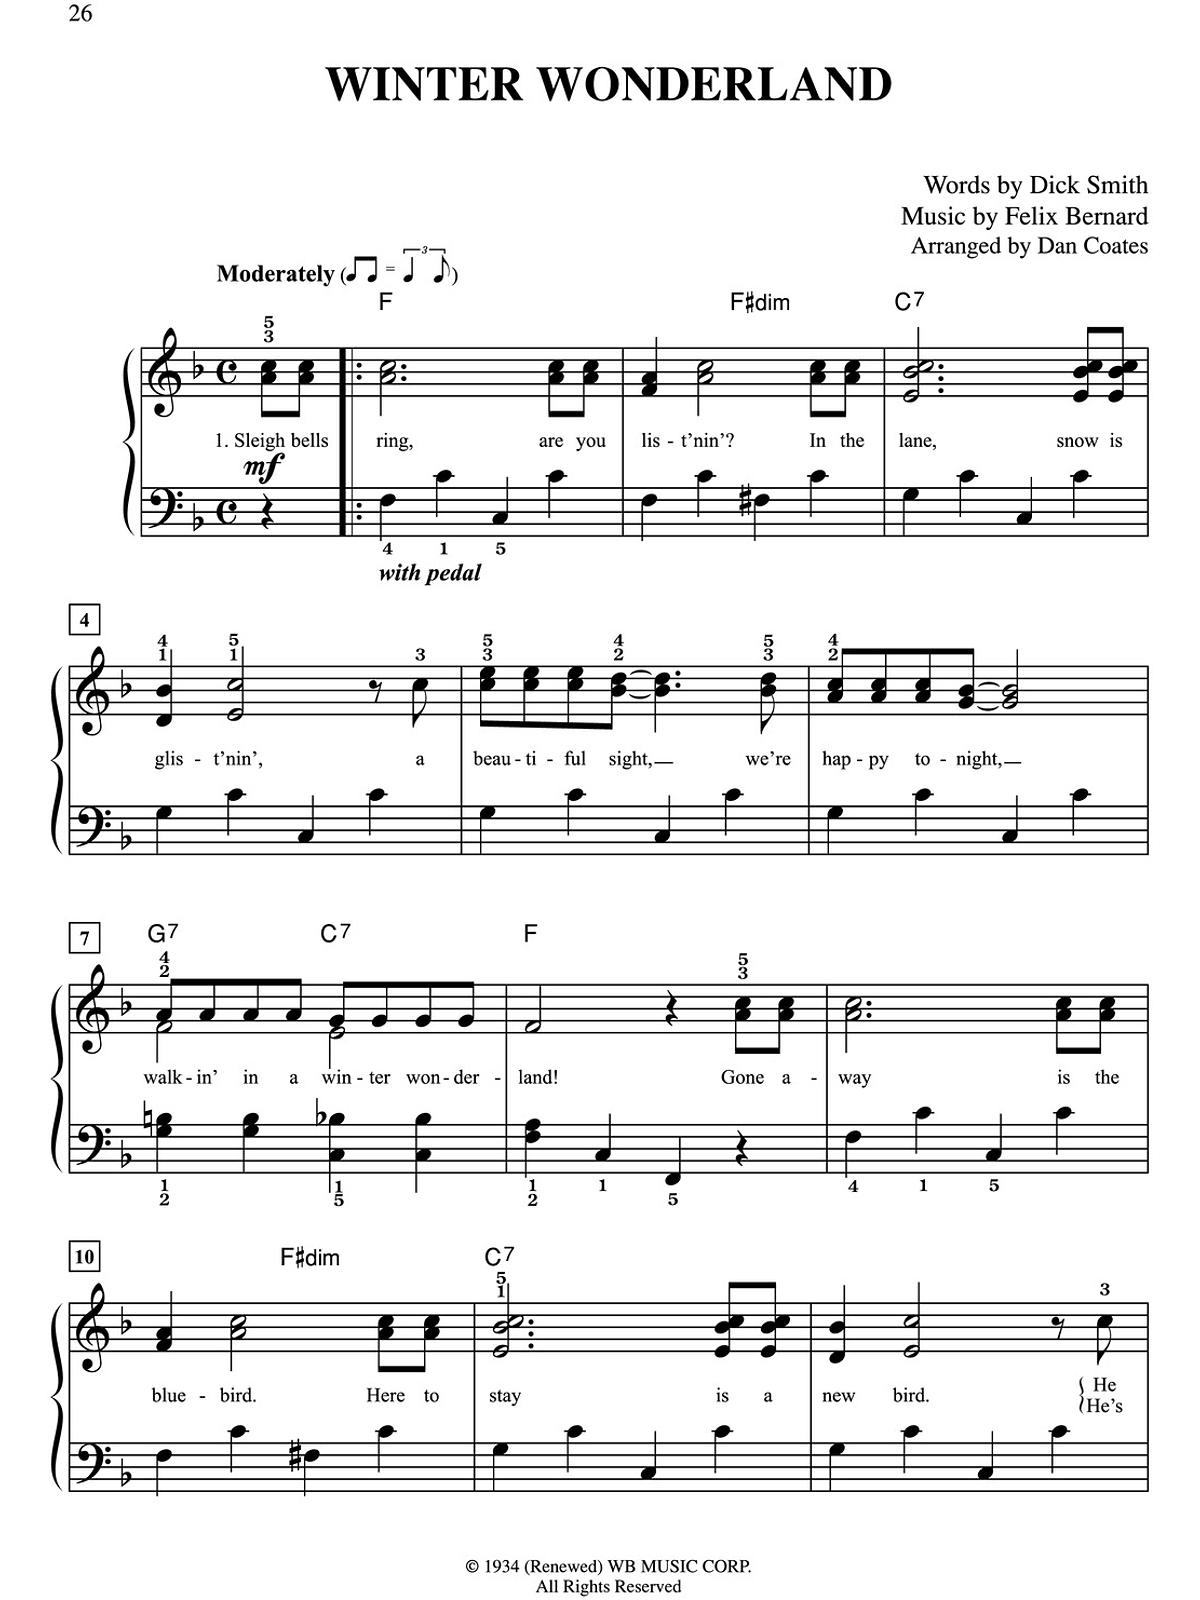 Winter wonderland music lyrics 10 for 10 sheet music